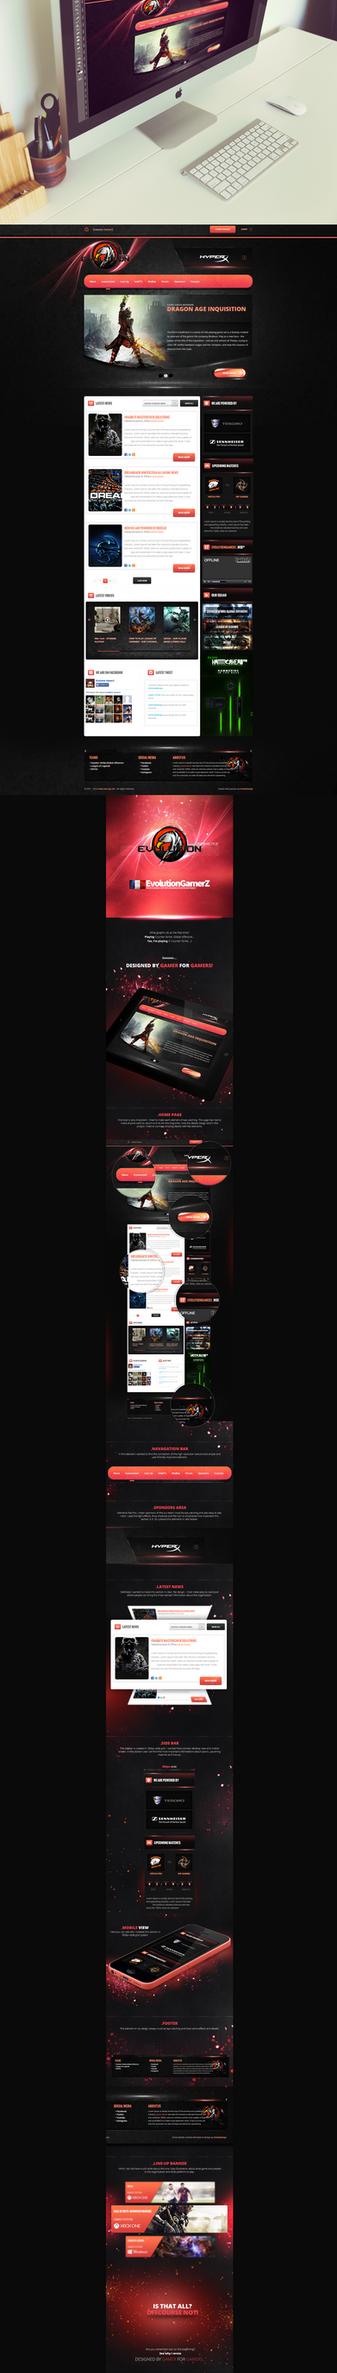 Evolution GamerZ by trkwebdesign